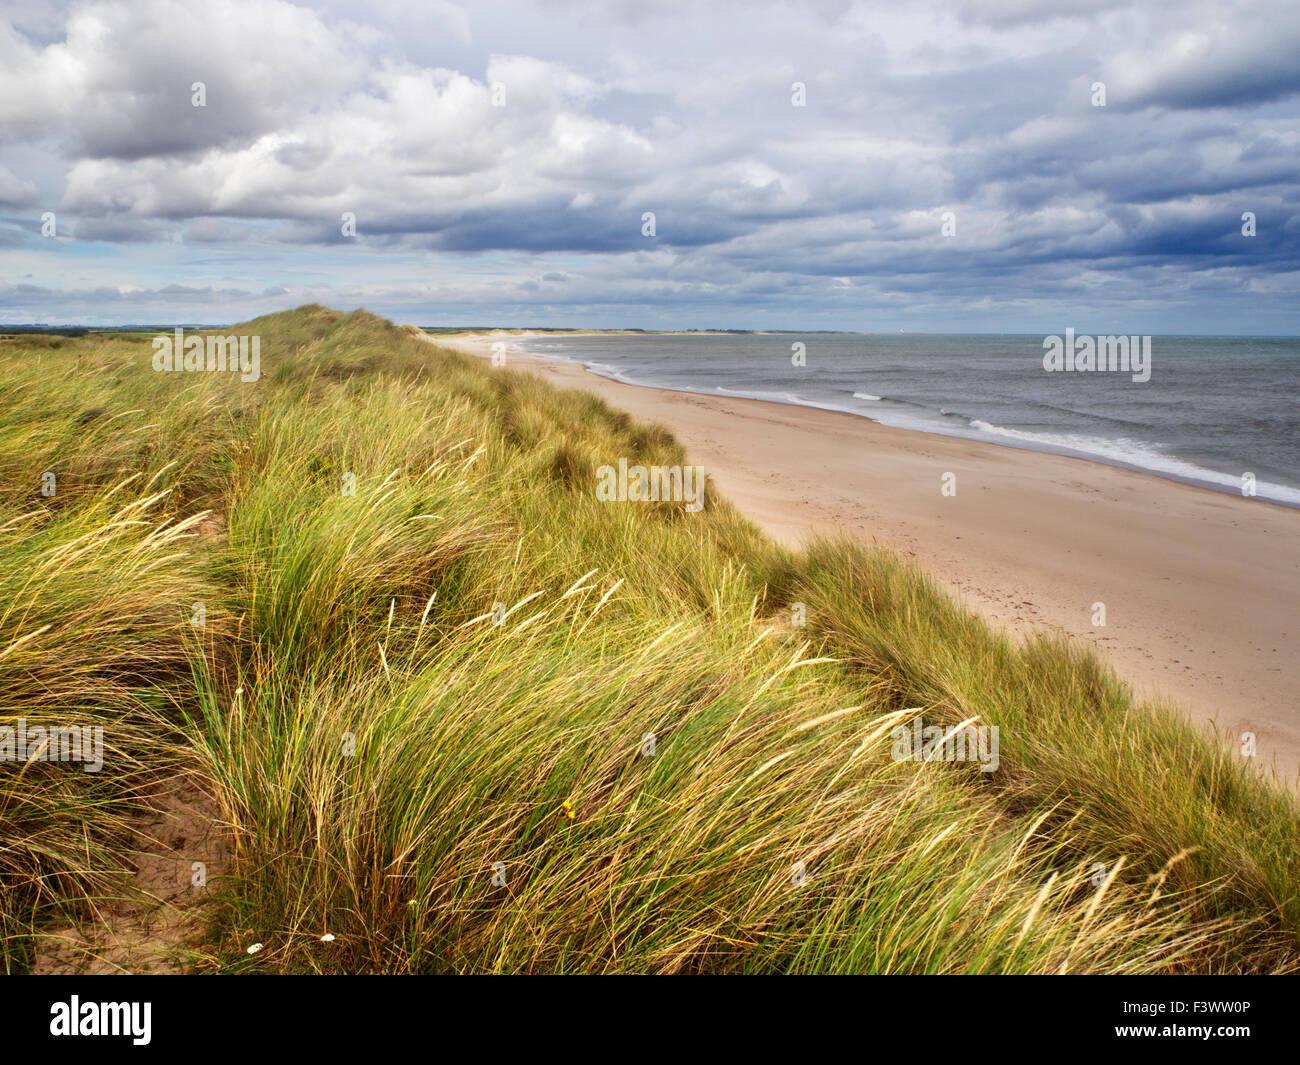 Dune Grasses at Druridge Bay near Amble by the Sea on the Northumberland Coast England - Stock Image